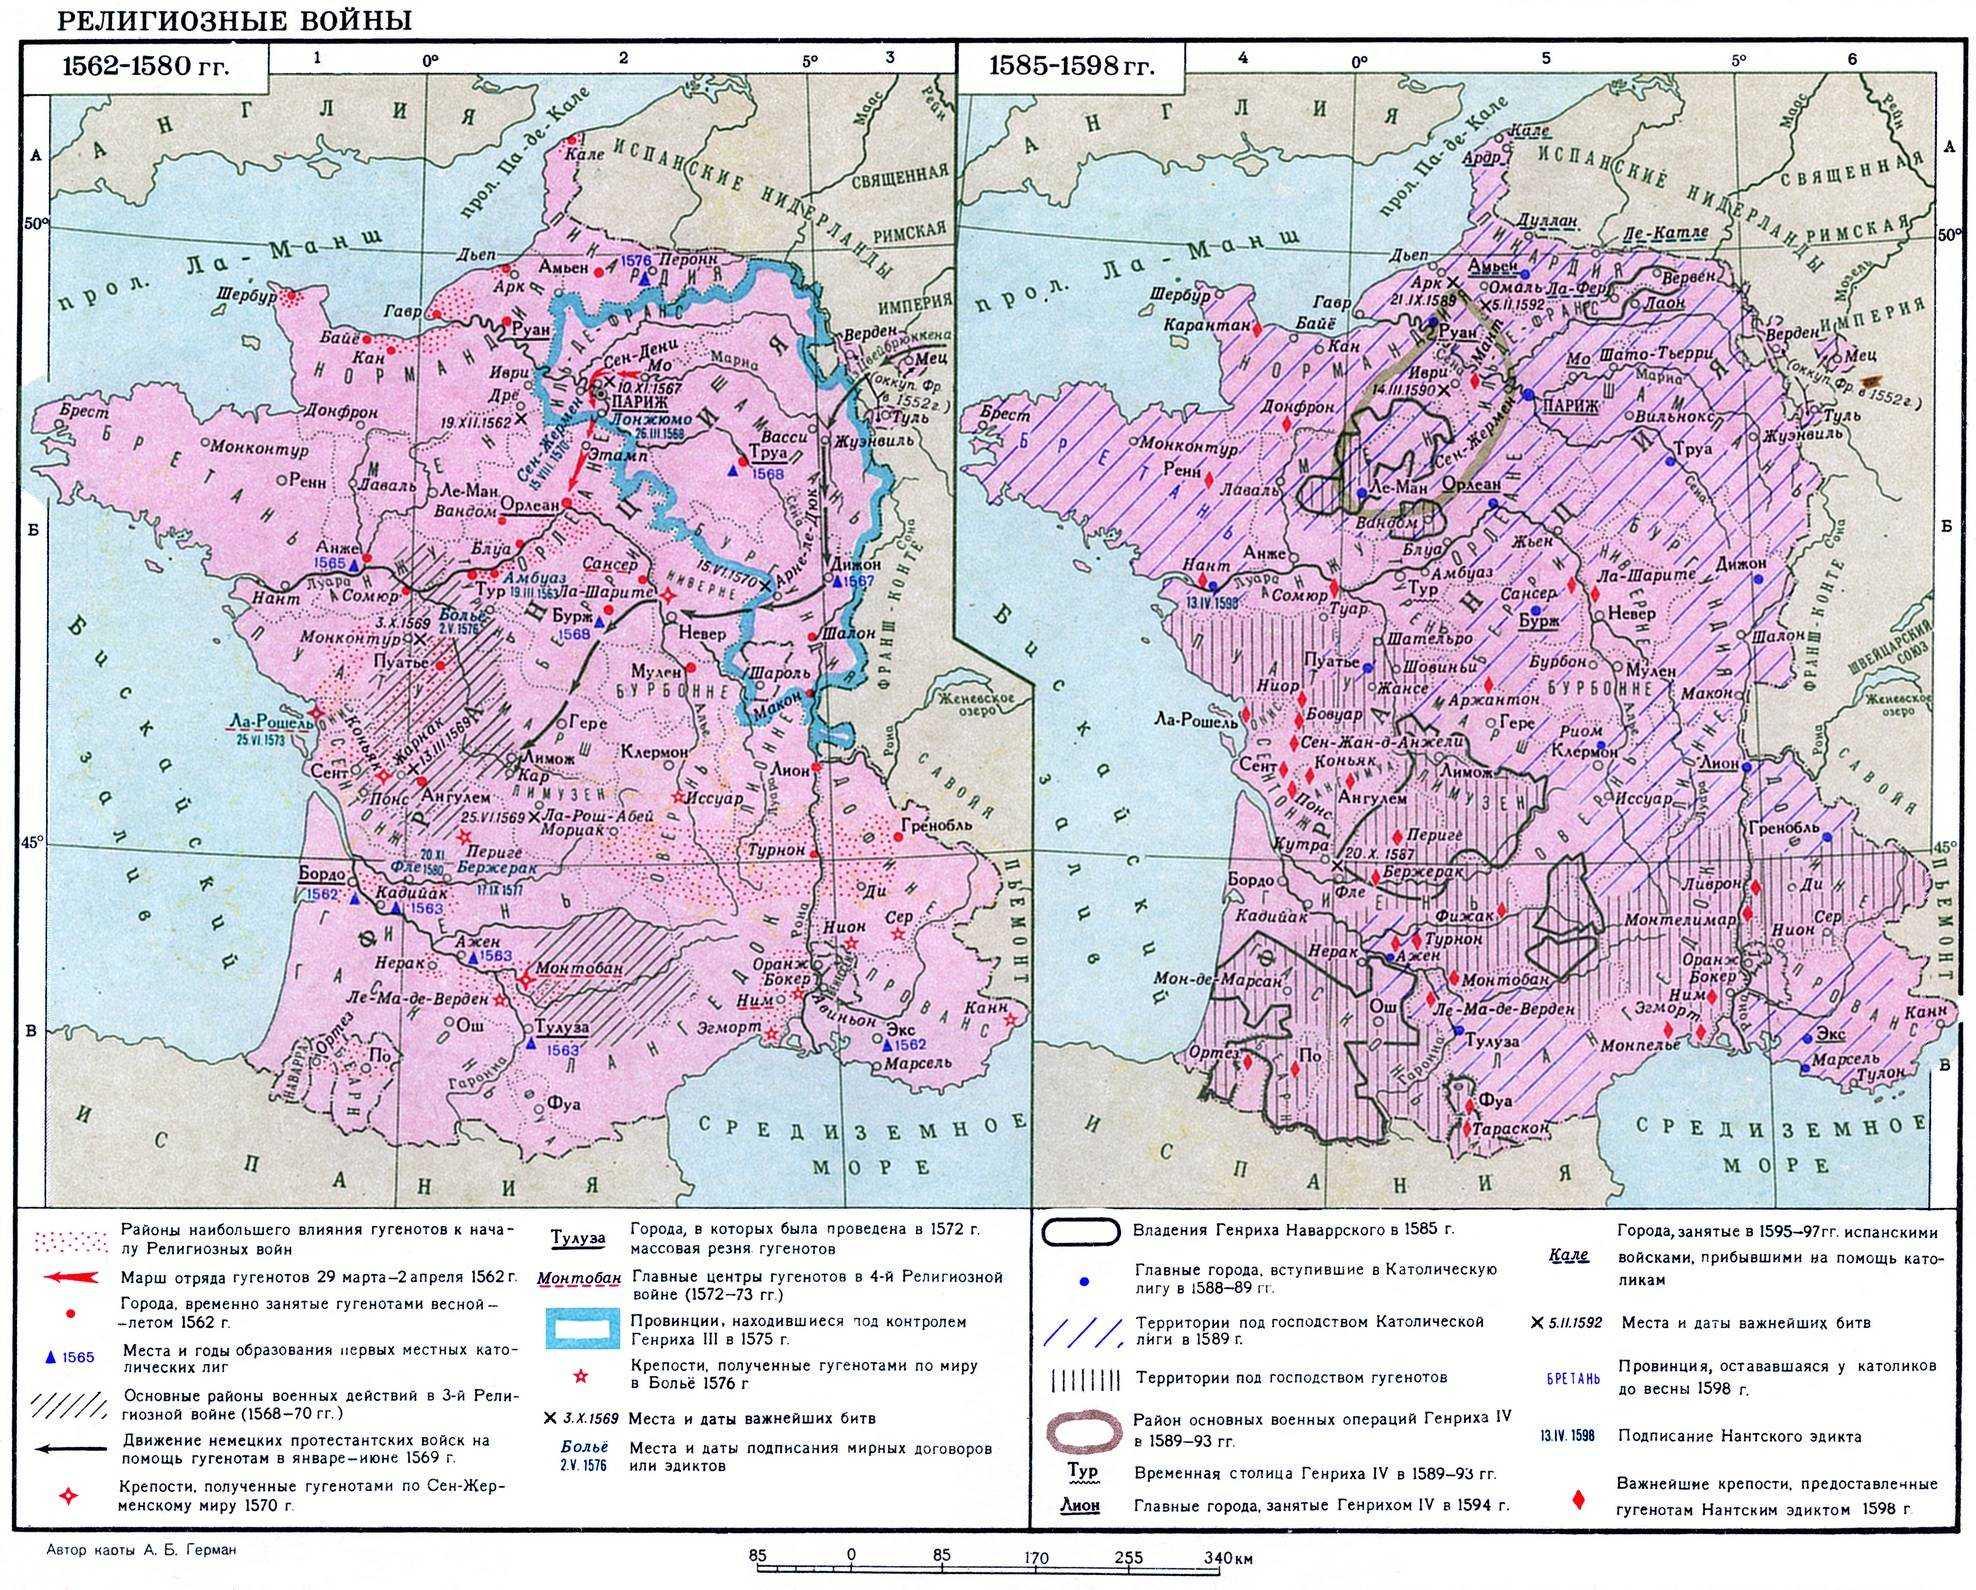 Карта боевых действий.